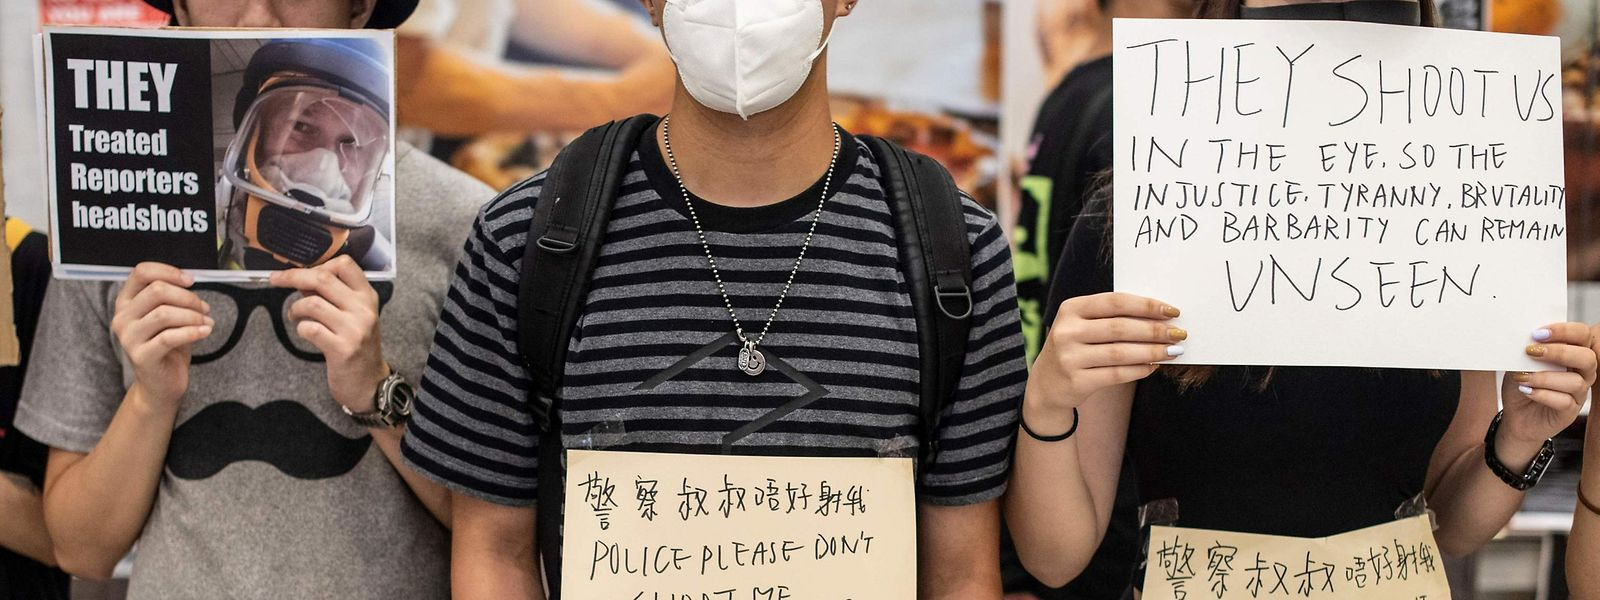 Demonstranten am Flughafen.